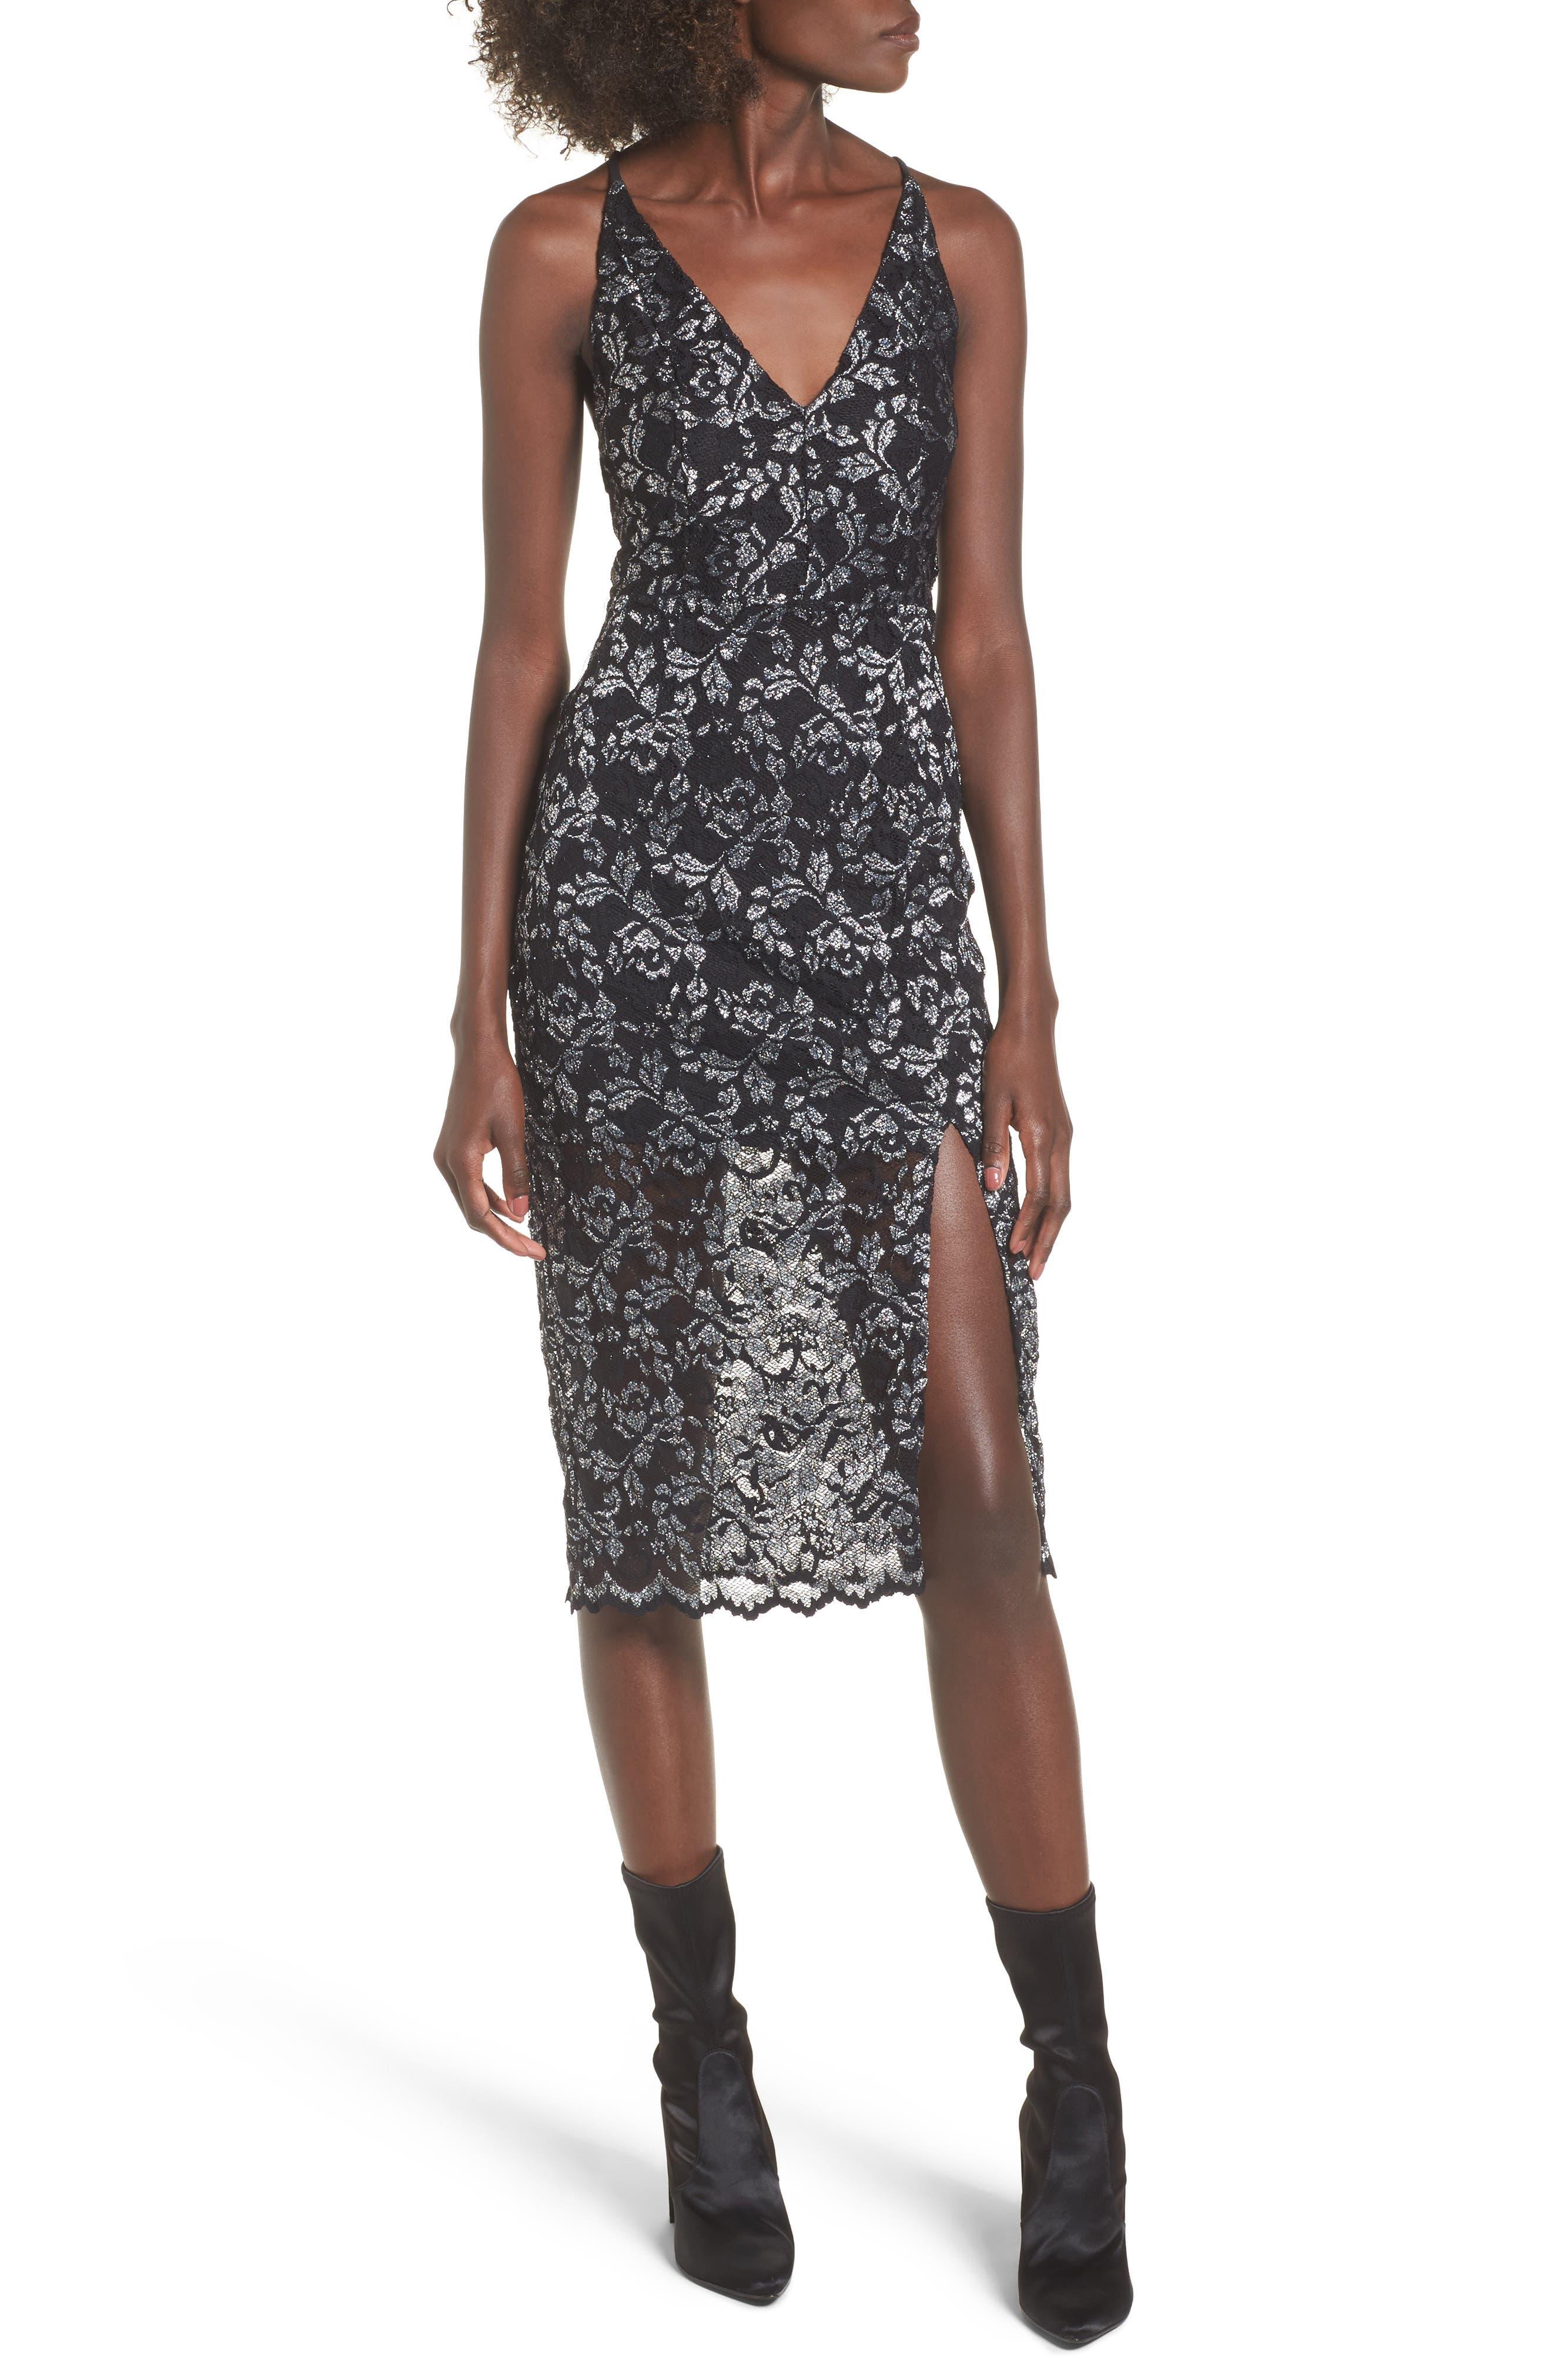 Sitabella Lace Dress,                         Main,                         color, Black/ Silver